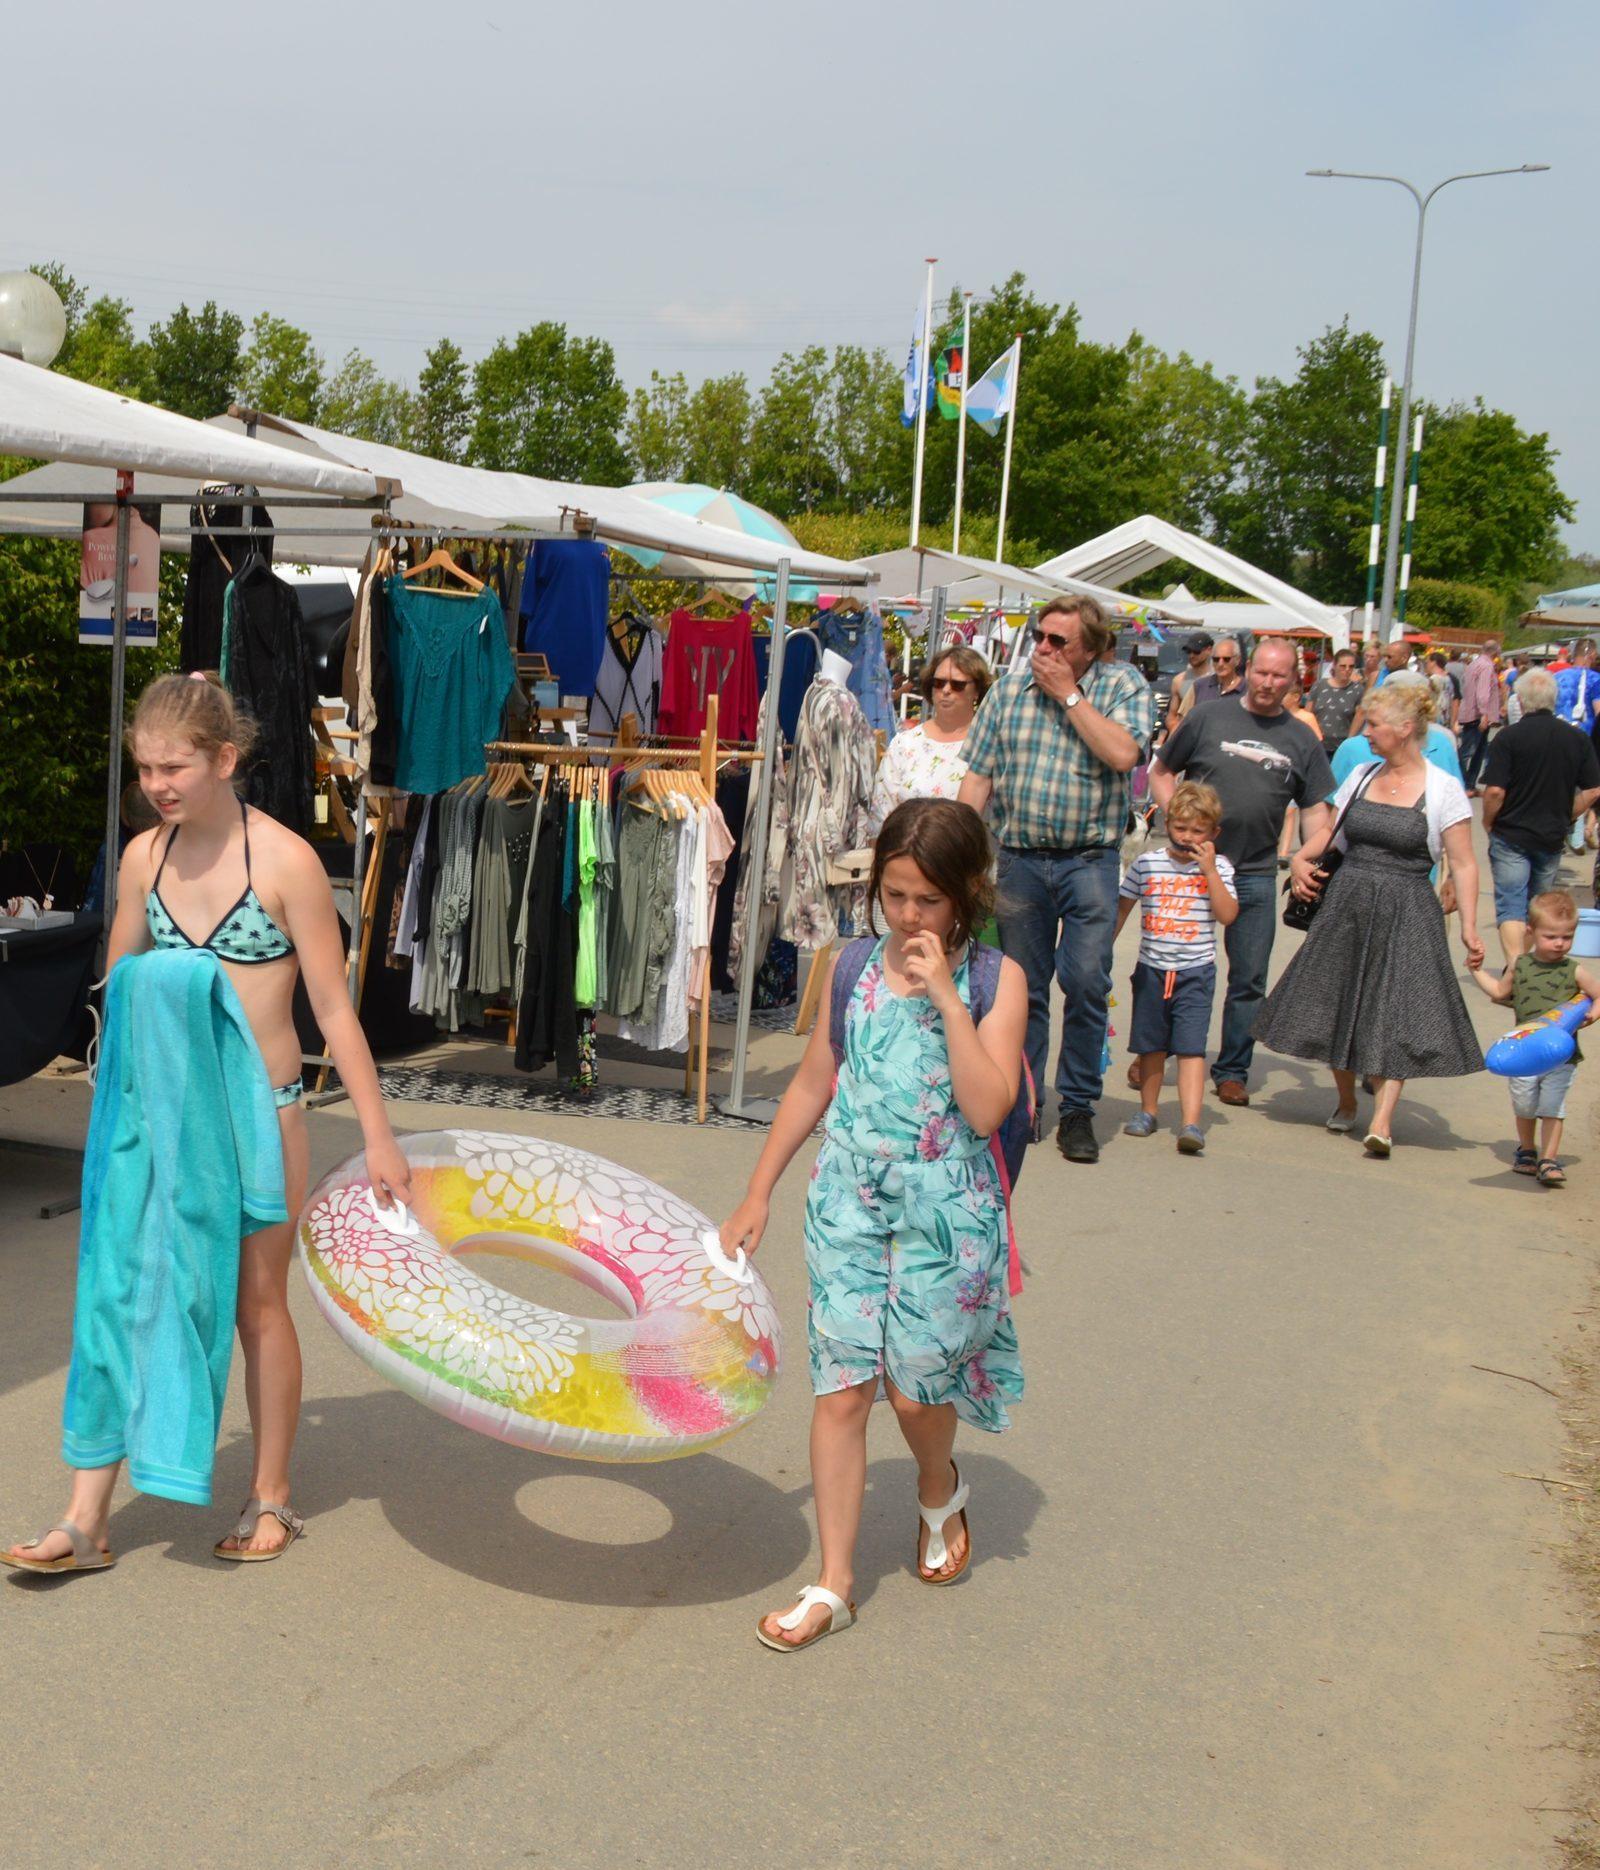 lanz bulldog museum vollenhove oldtimer festival vollenhove